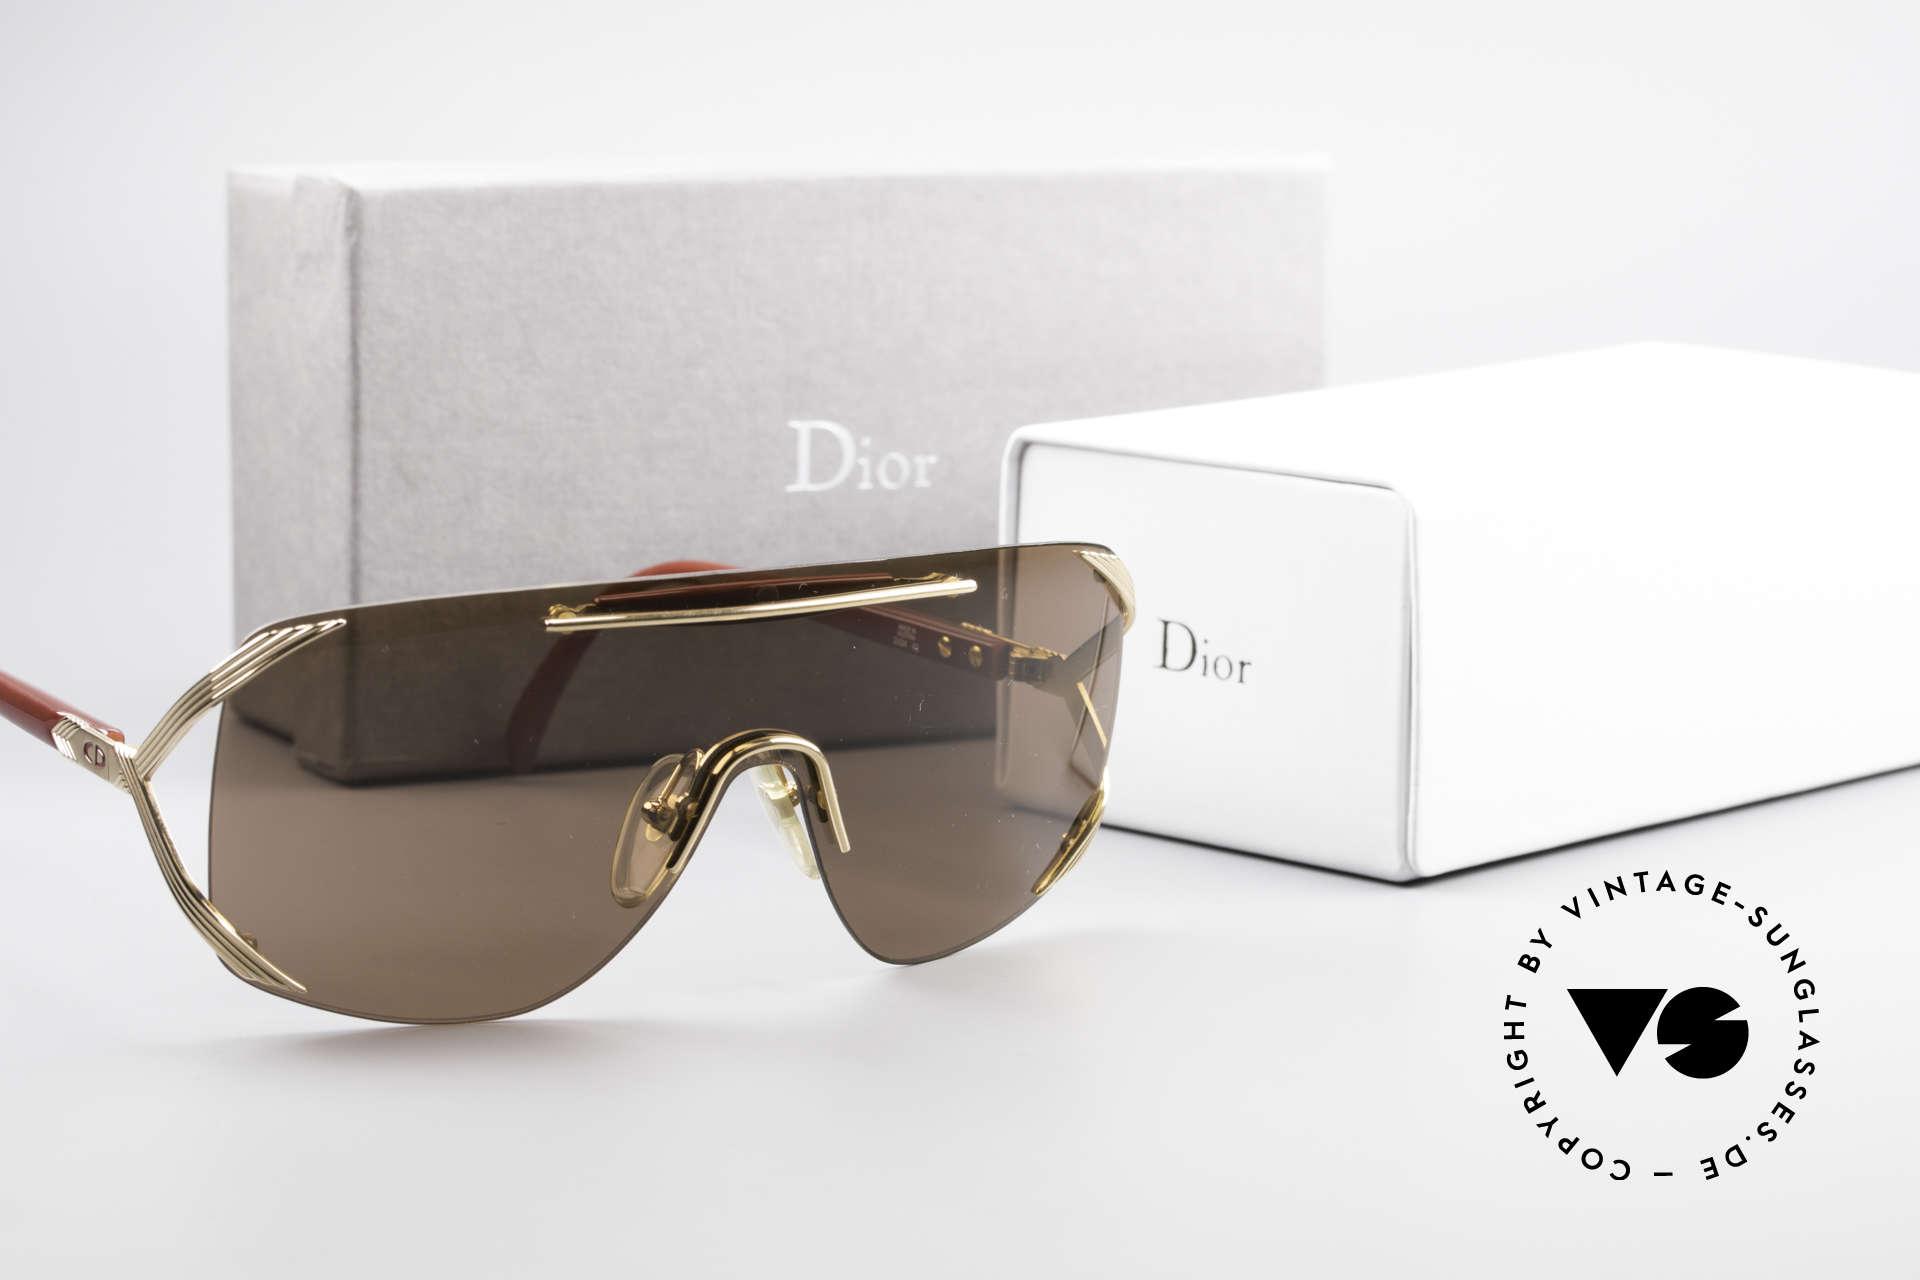 Christian Dior 2434 Rihanna Vintage Sunglasses, Size: medium, Made for Women